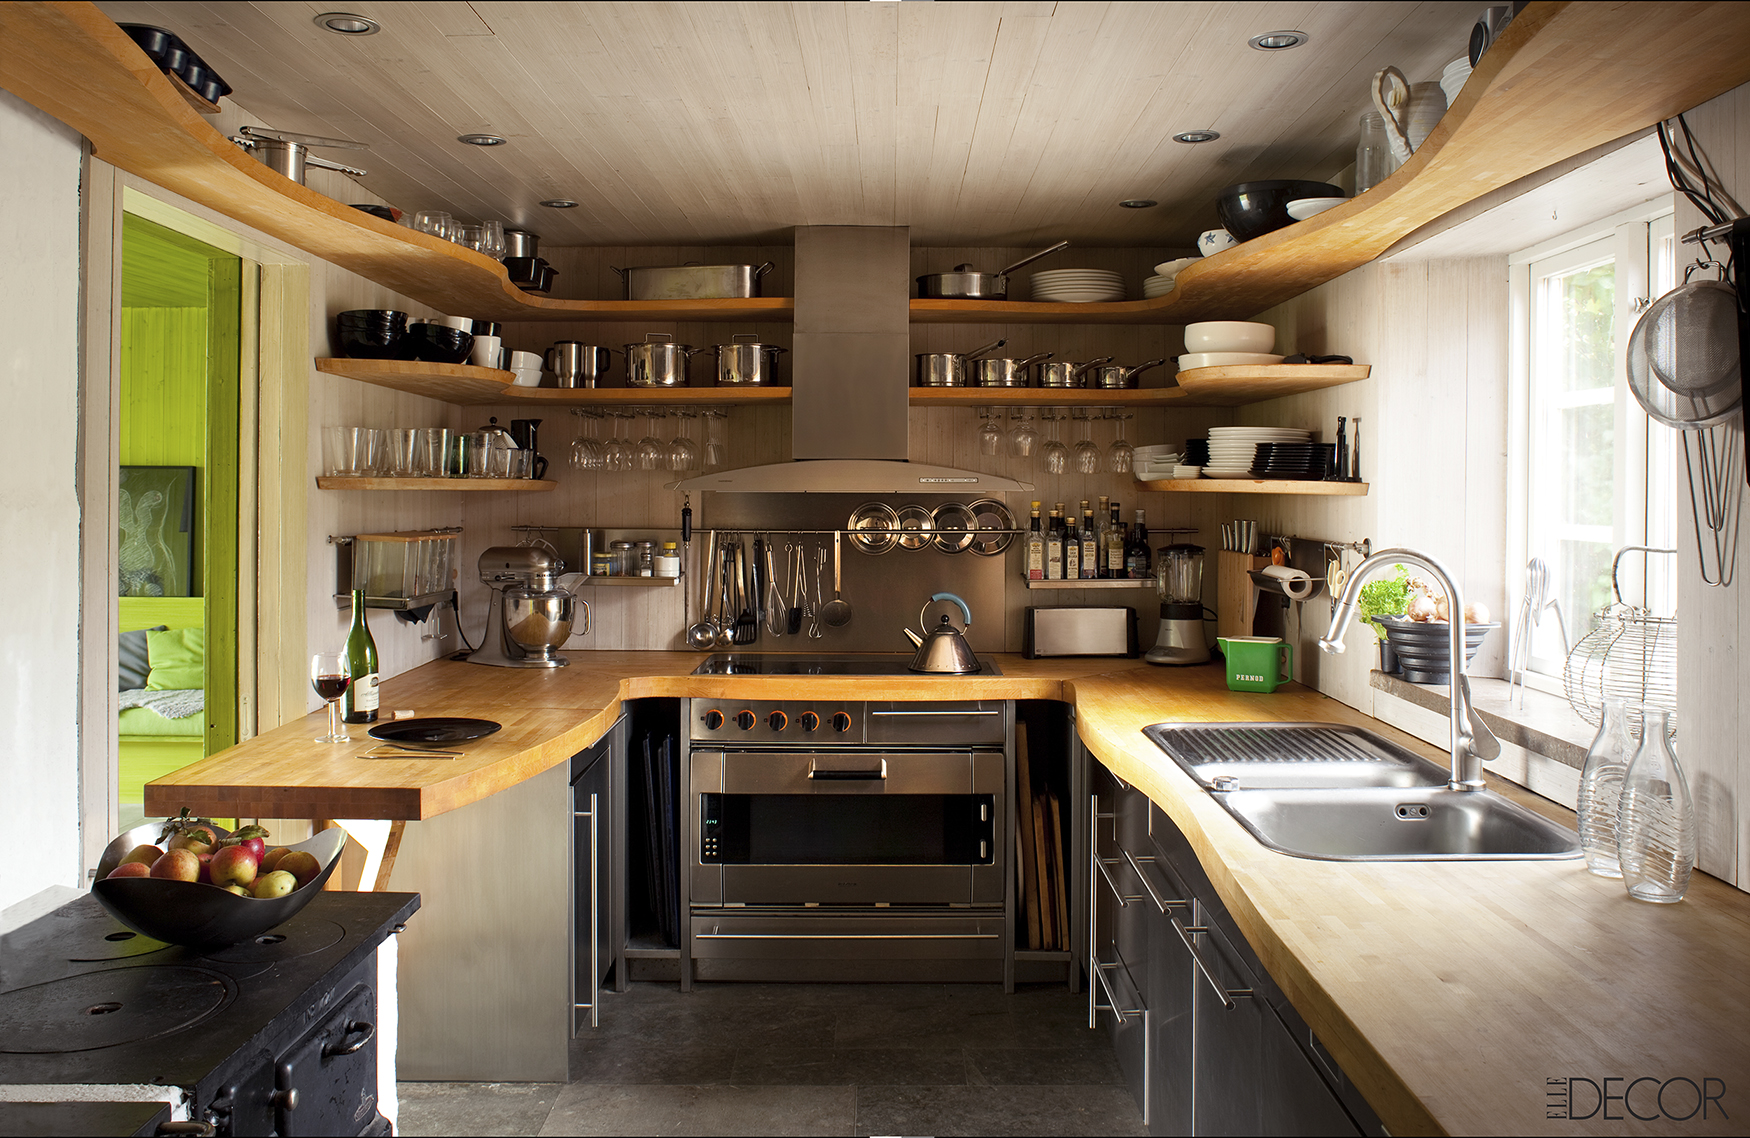 30 small kitchen design ideas decorating tiny kitchens - Kitchen and bathroom design models ...